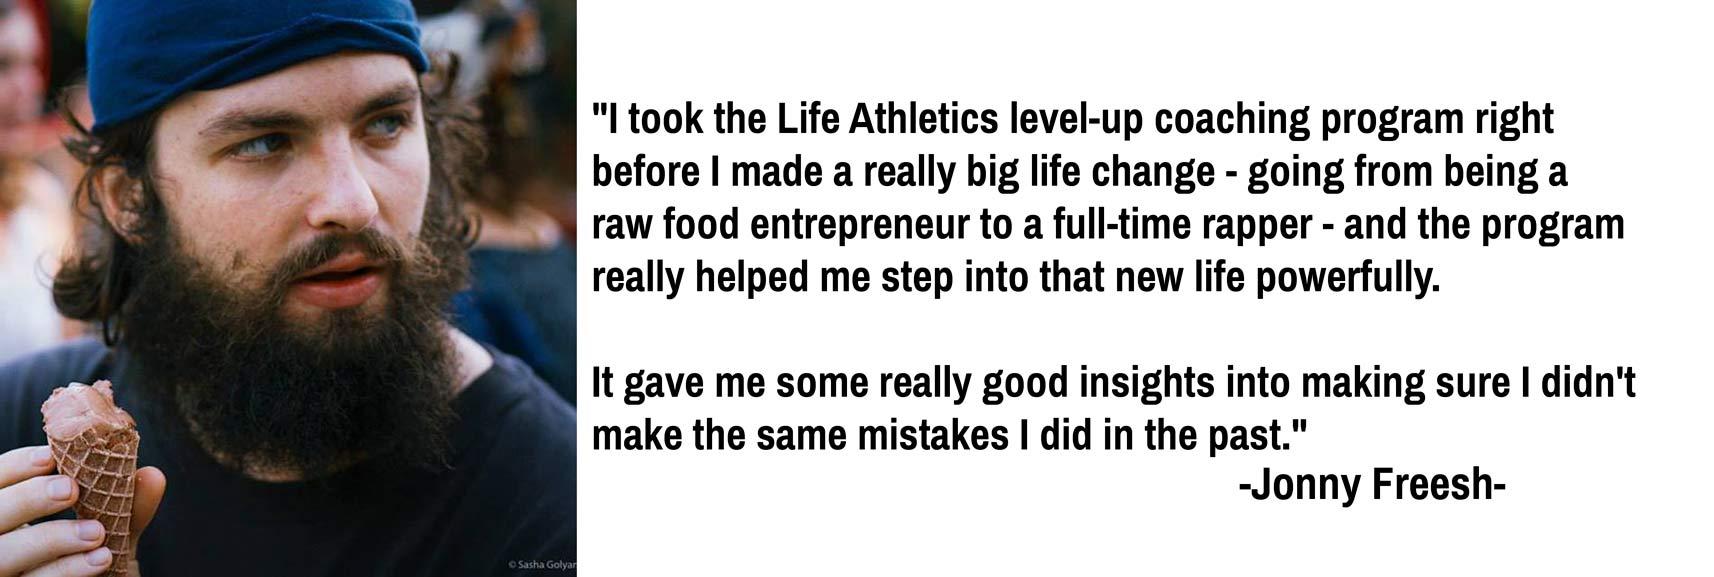 Life-Athletics-testimonials-Freesh.jpg